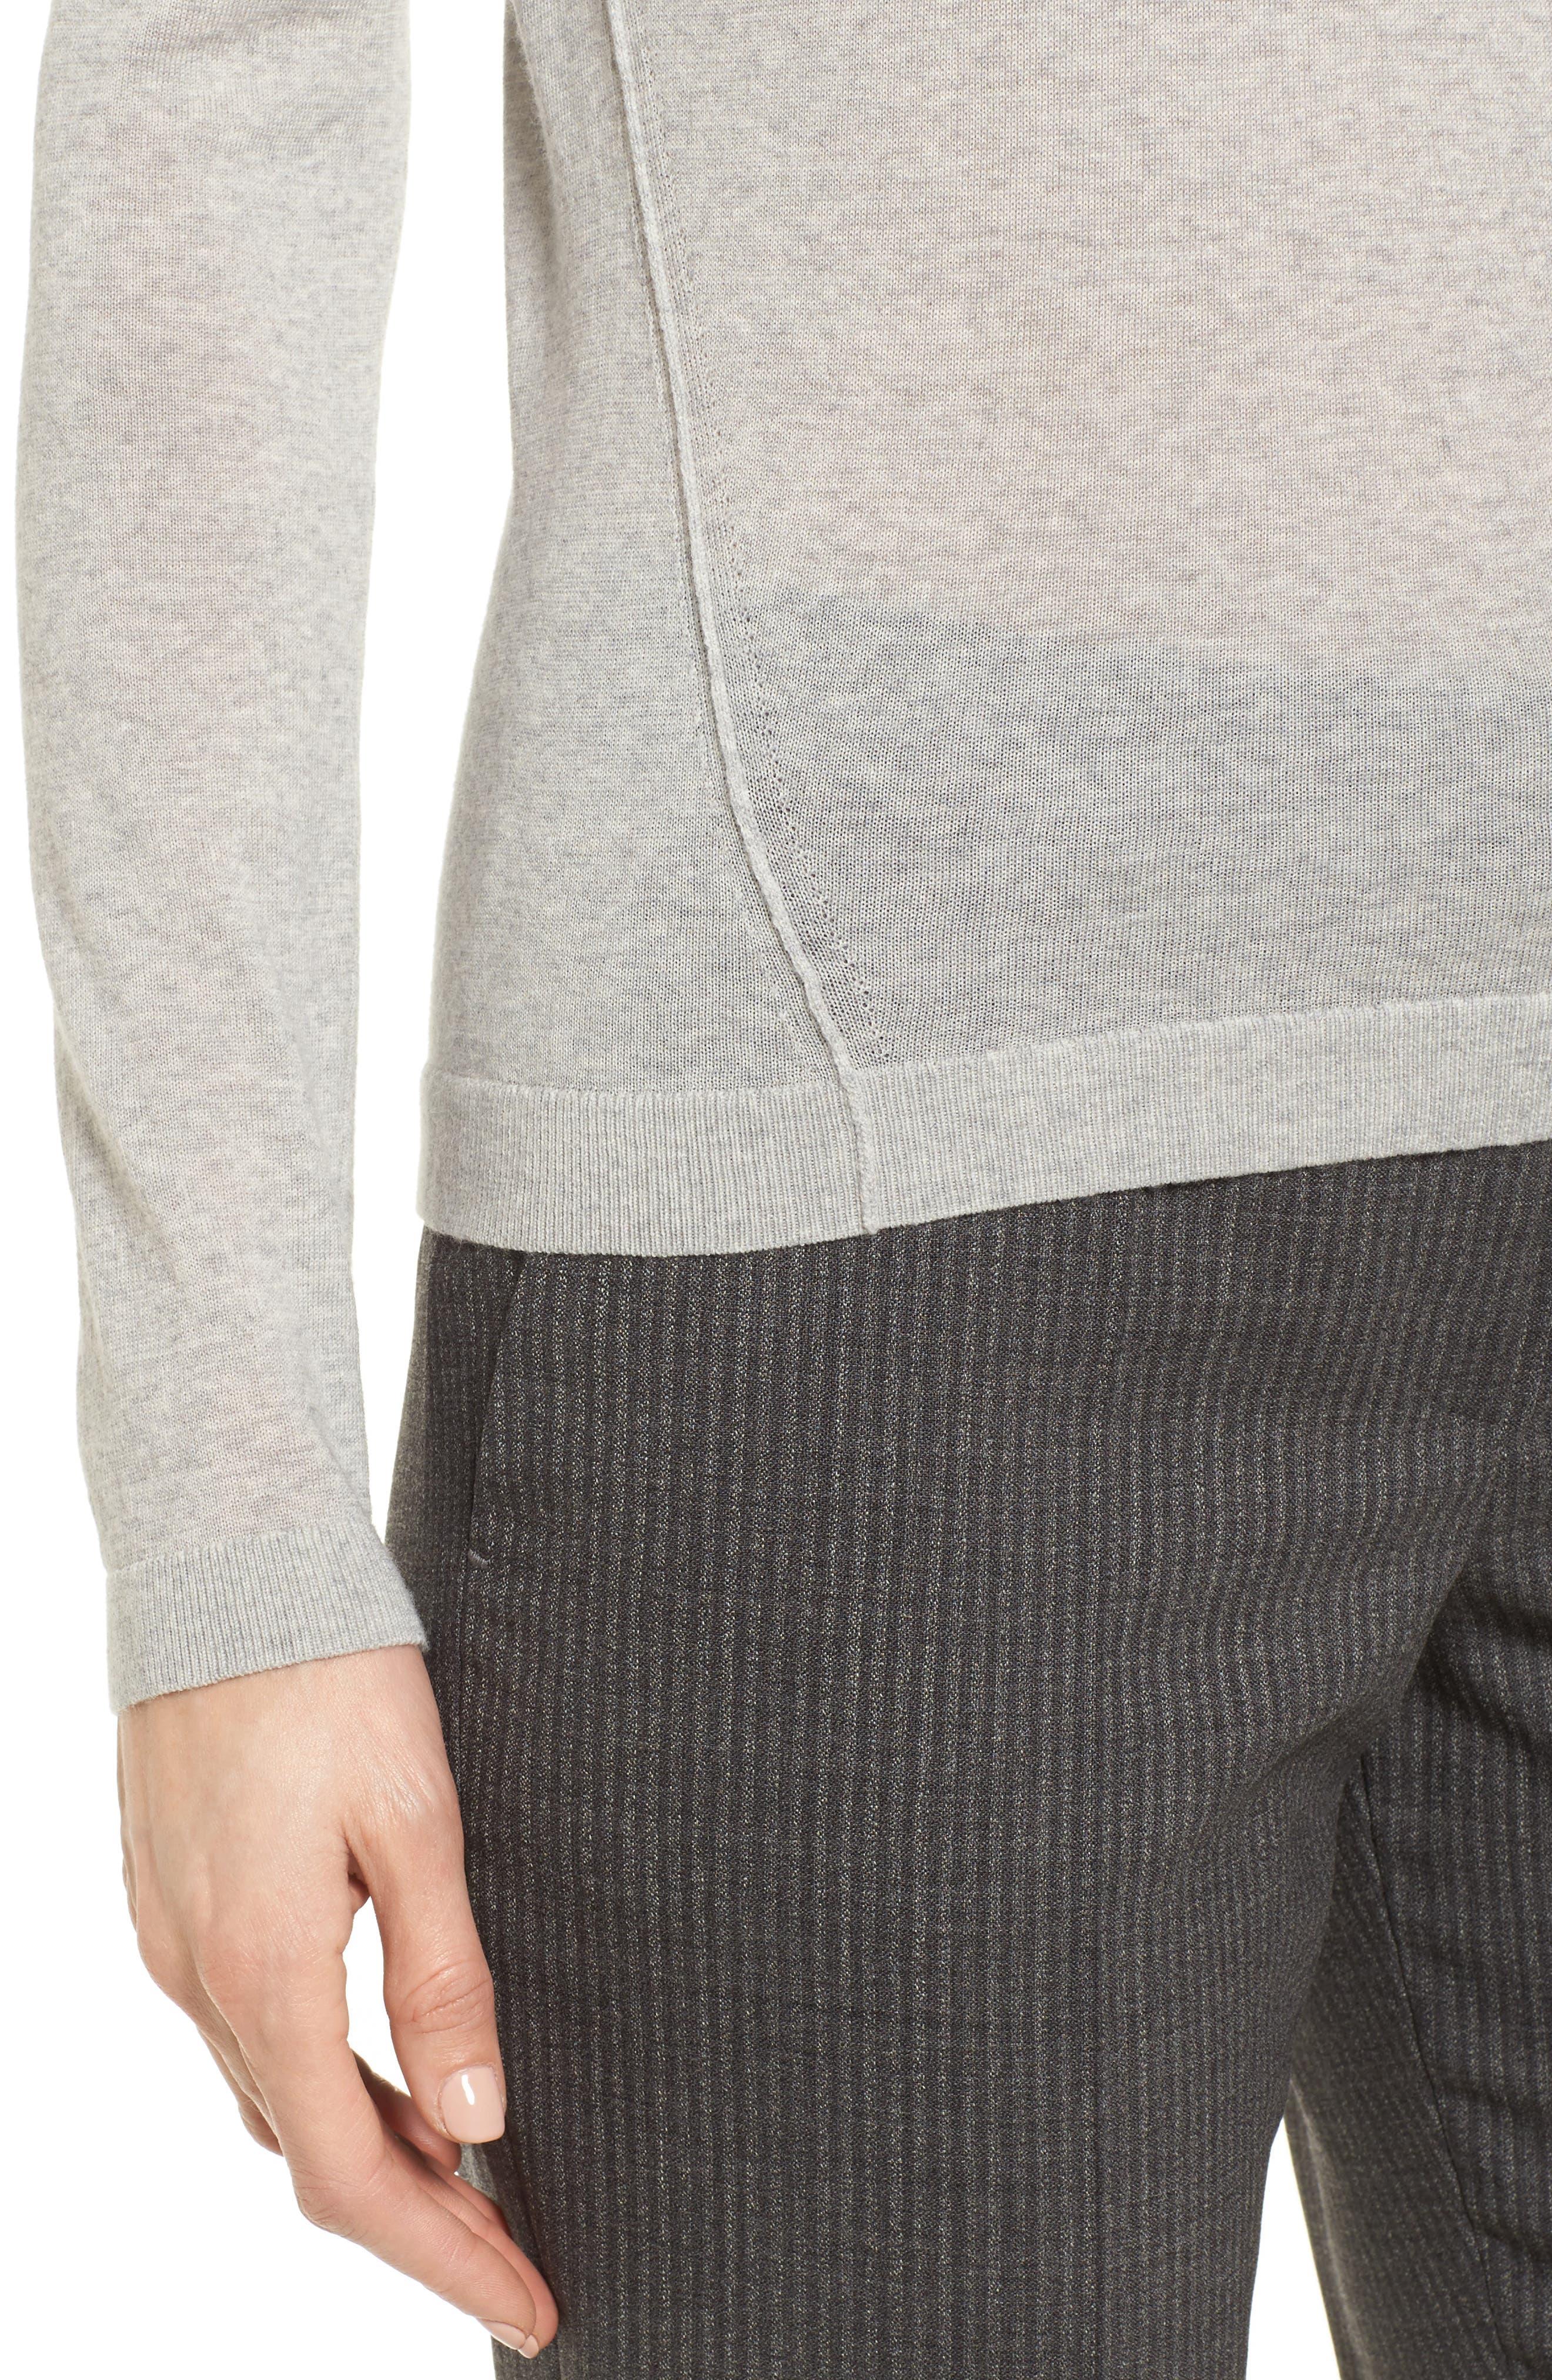 Fayme Wool Crewneck Sweater,                             Alternate thumbnail 4, color,                             Cozy Grey Melange